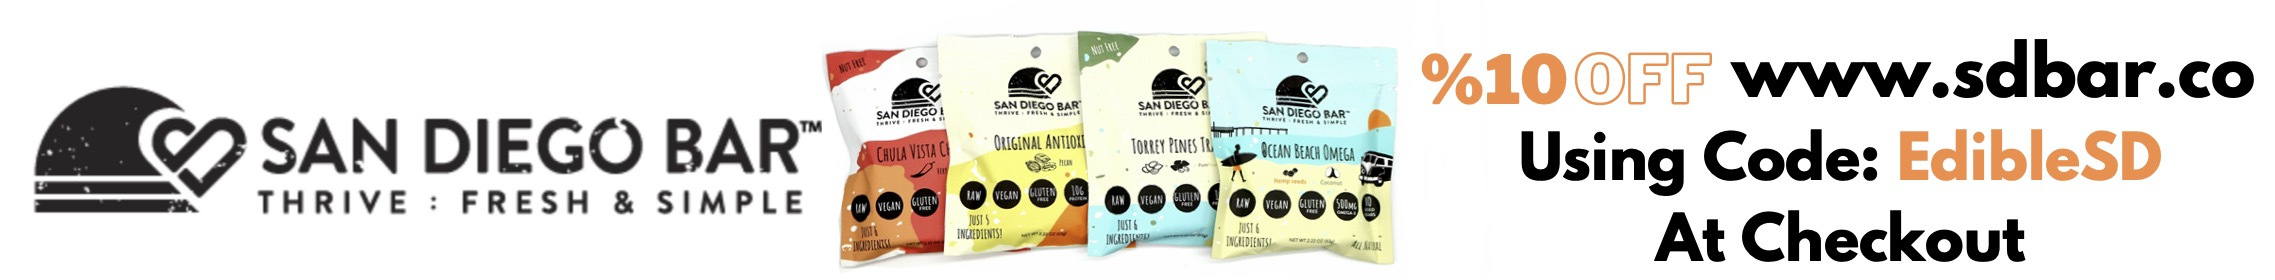 San Diego Bars